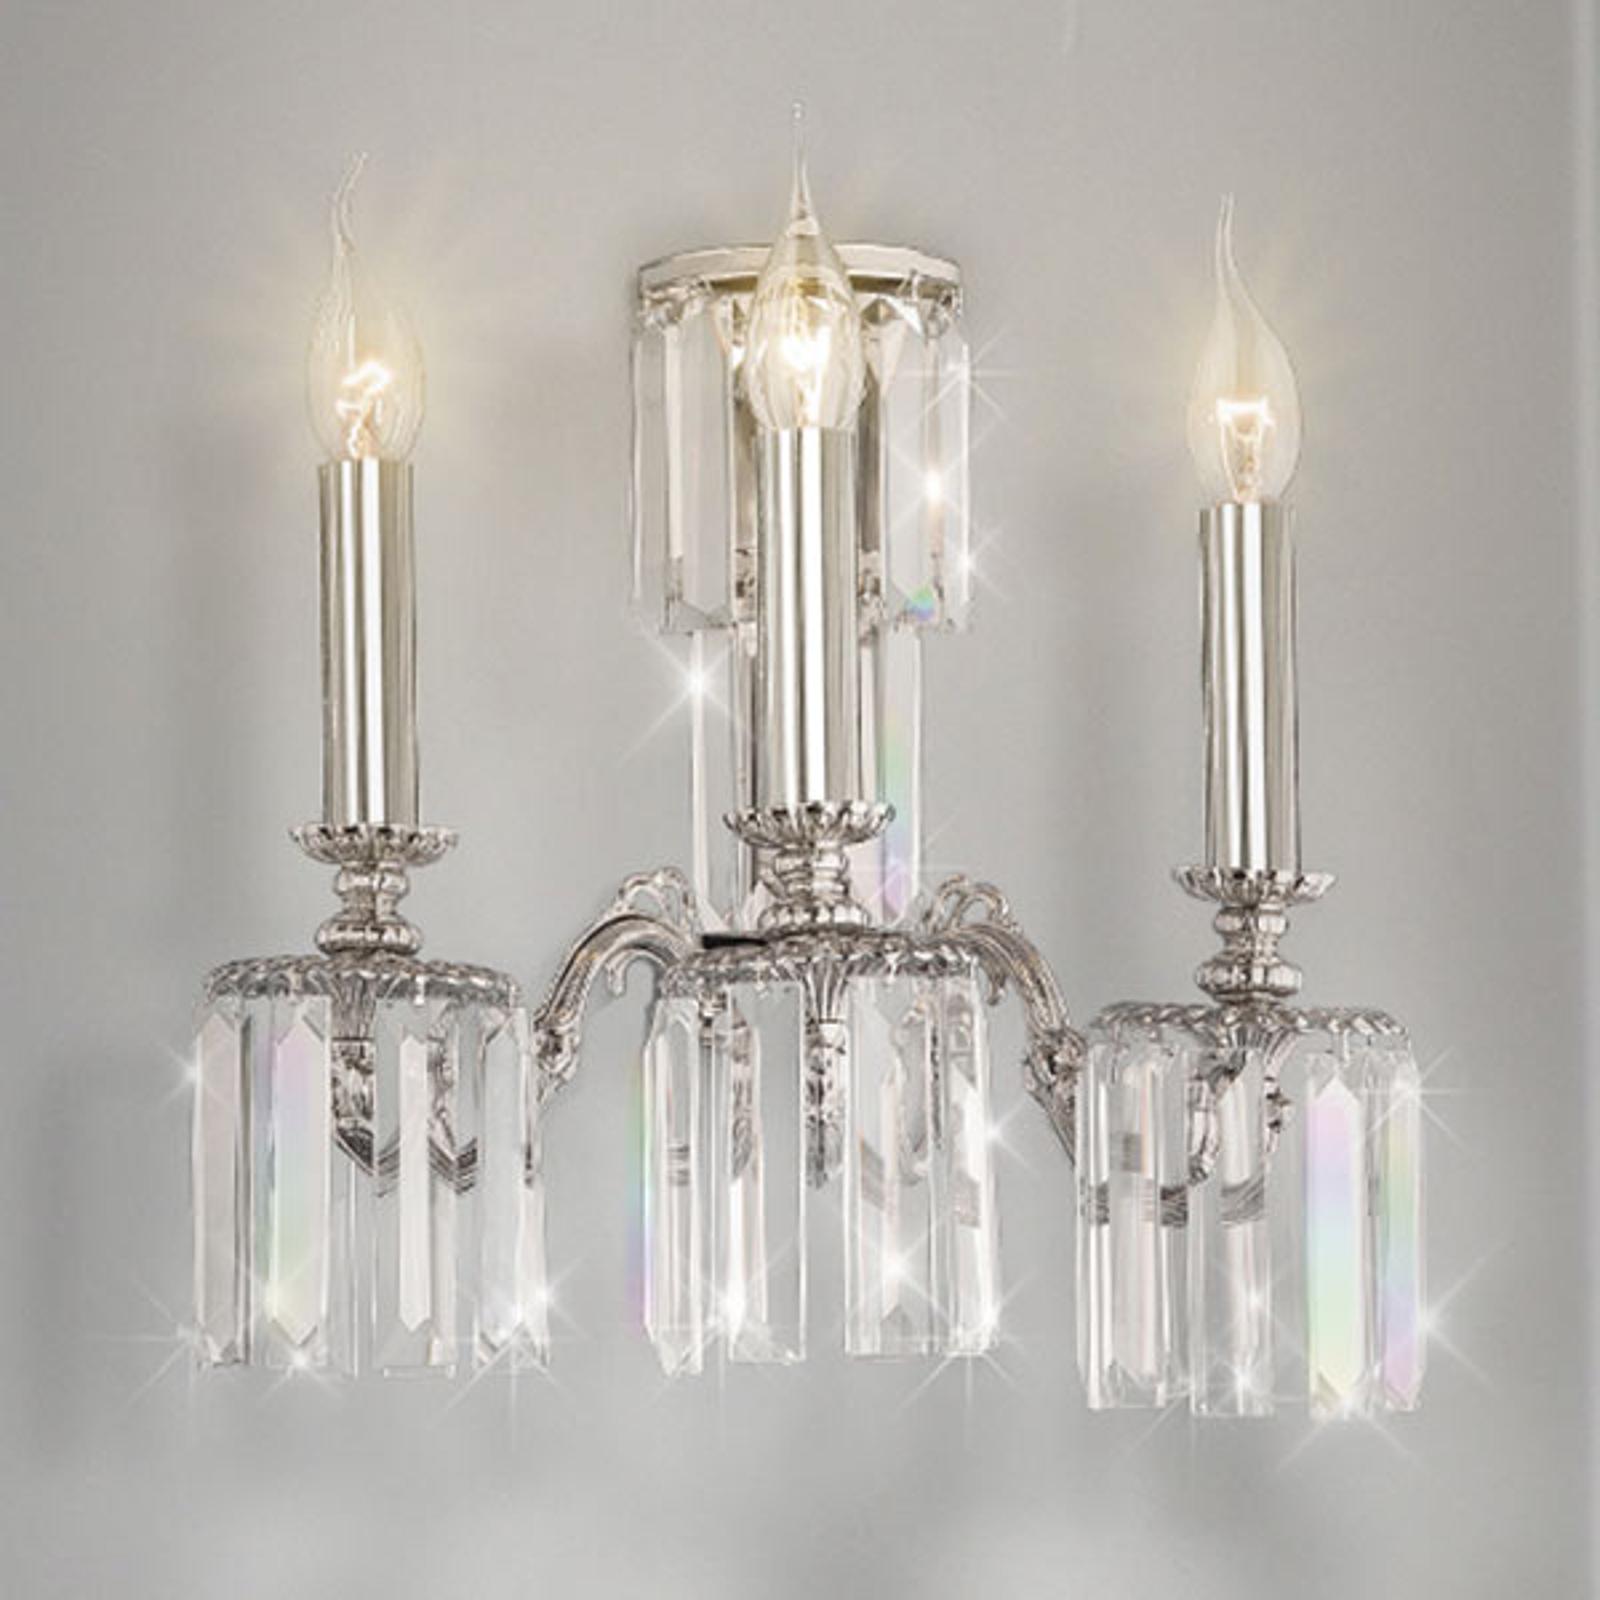 Vegglampe Sevilla med krystallglass, 3 lyskilder